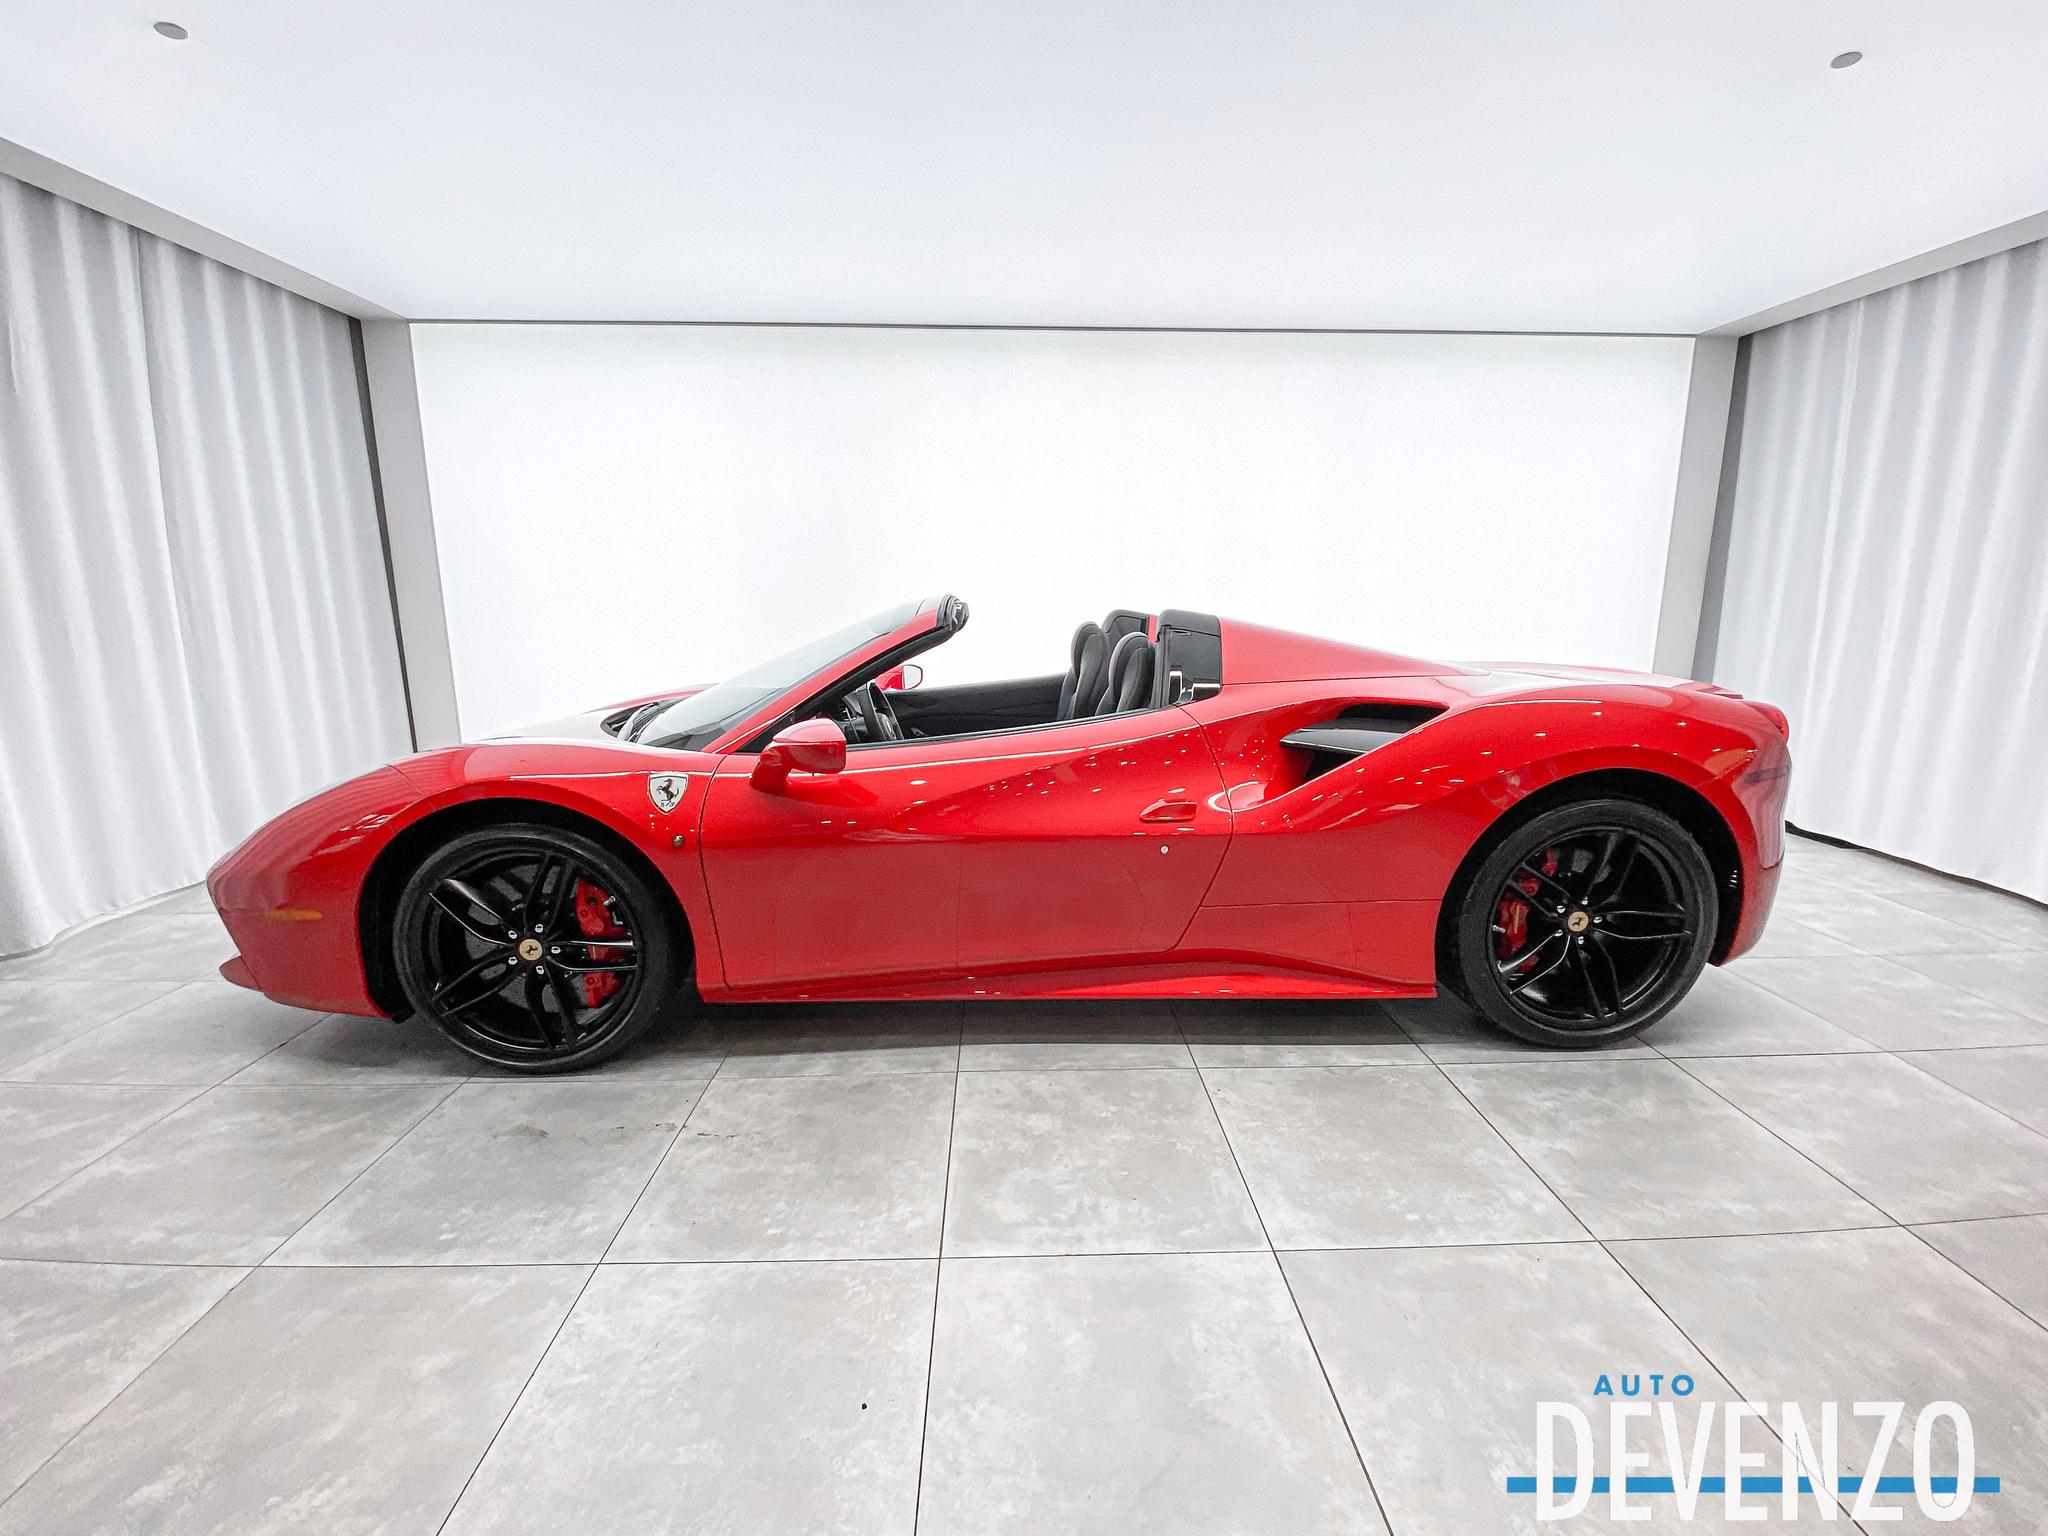 2019 Ferrari 488 Spider SPIDER SPORT EXHAUST / CARBON FIBER PACK complet